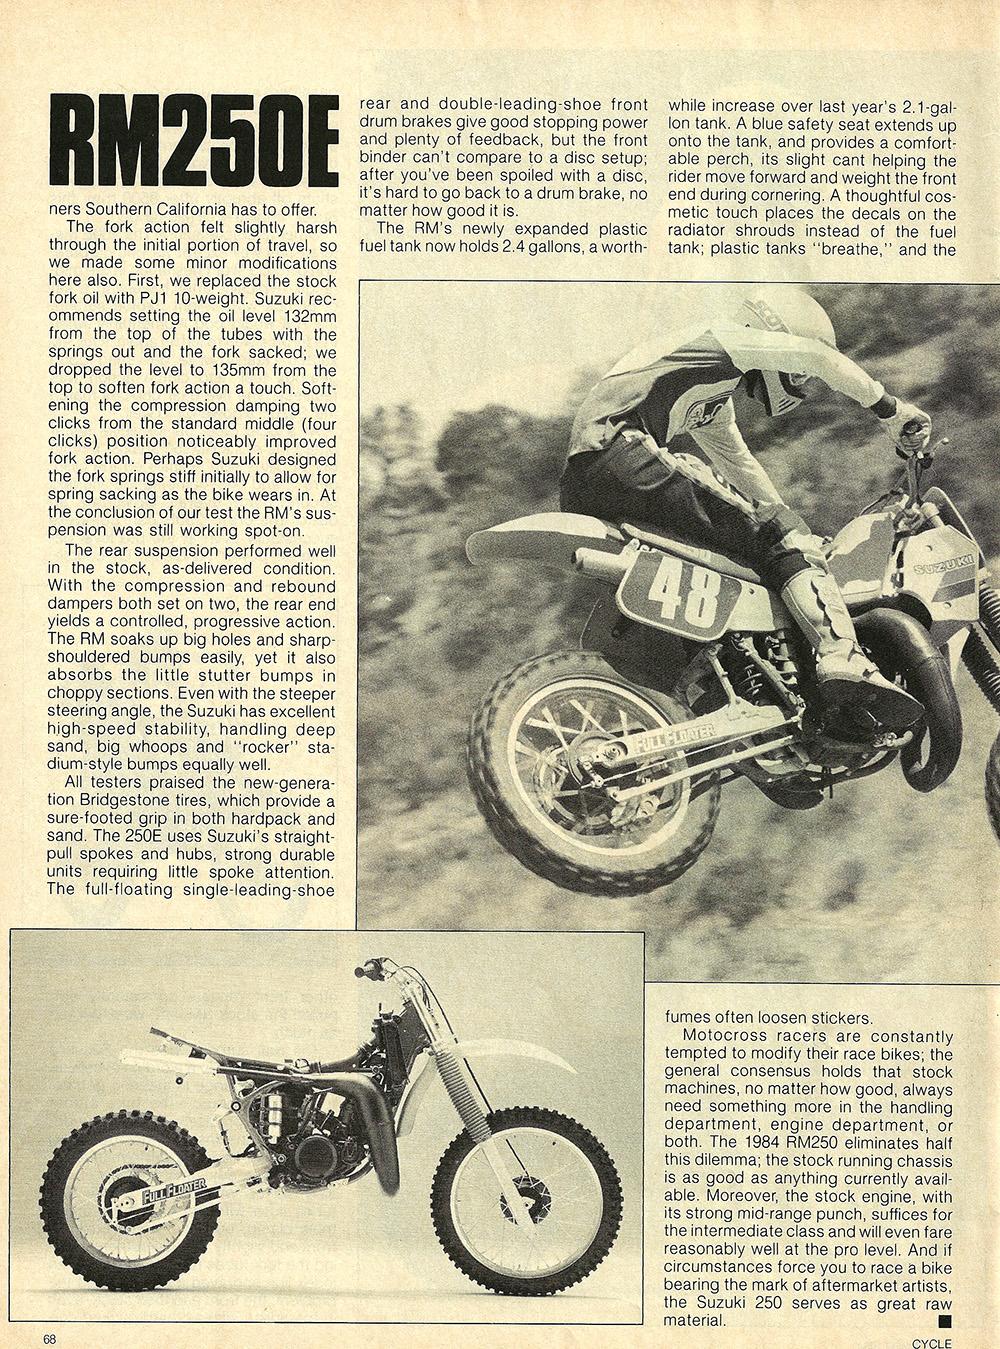 1984 Suzuki RM250 E road test 04.jpg